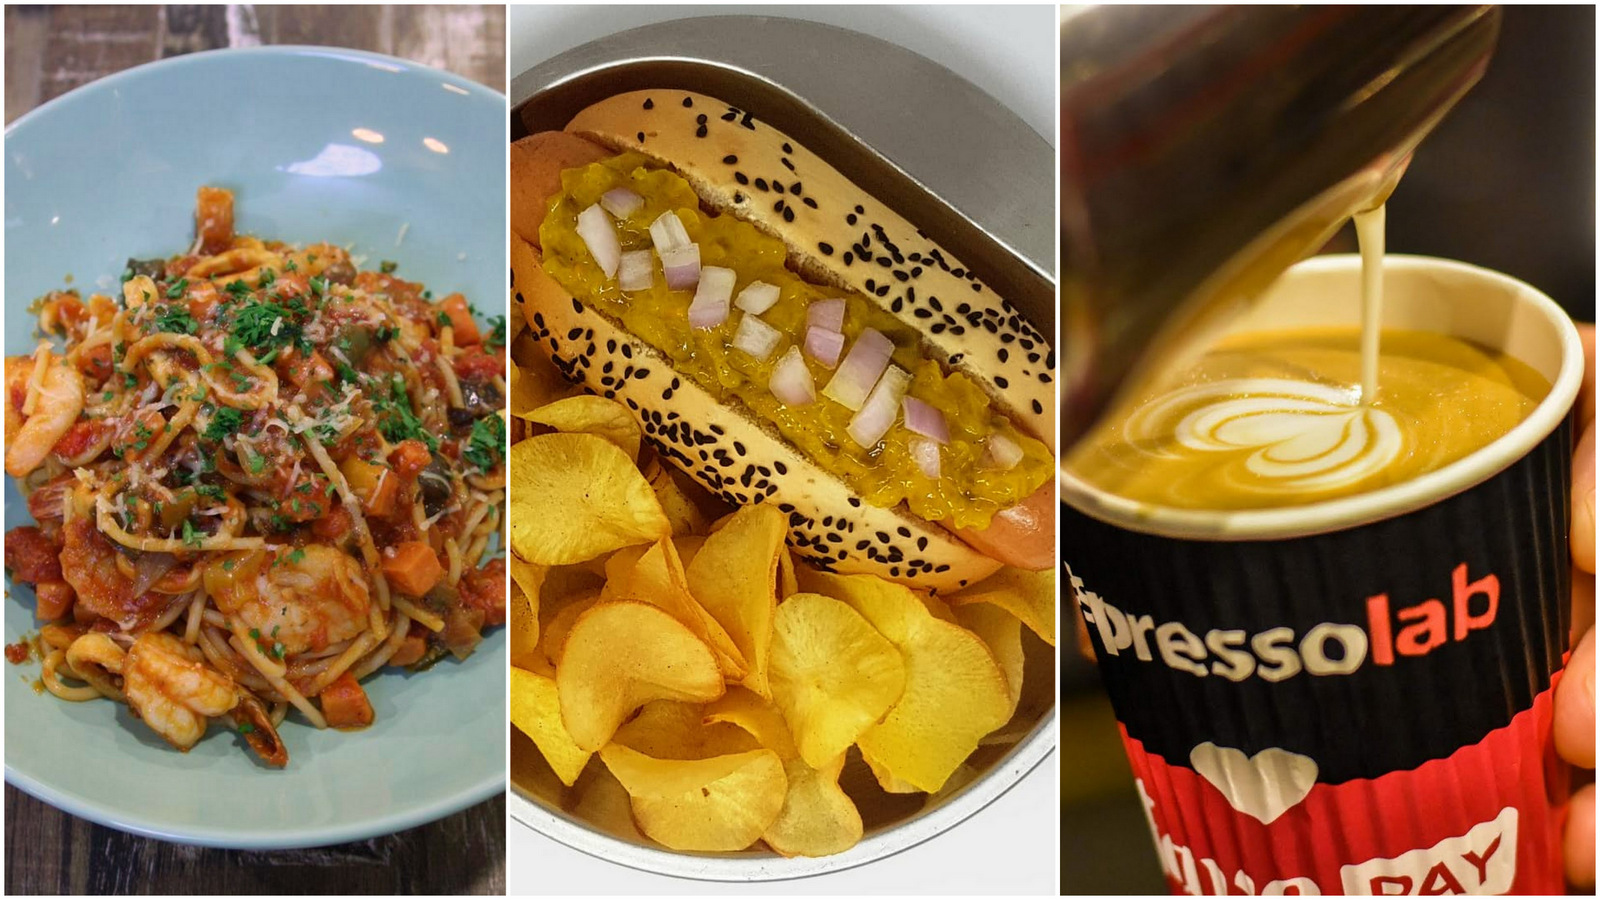 Maple Food Market: Happy Ele, Yoohoo Hot Dogs & Espressolab